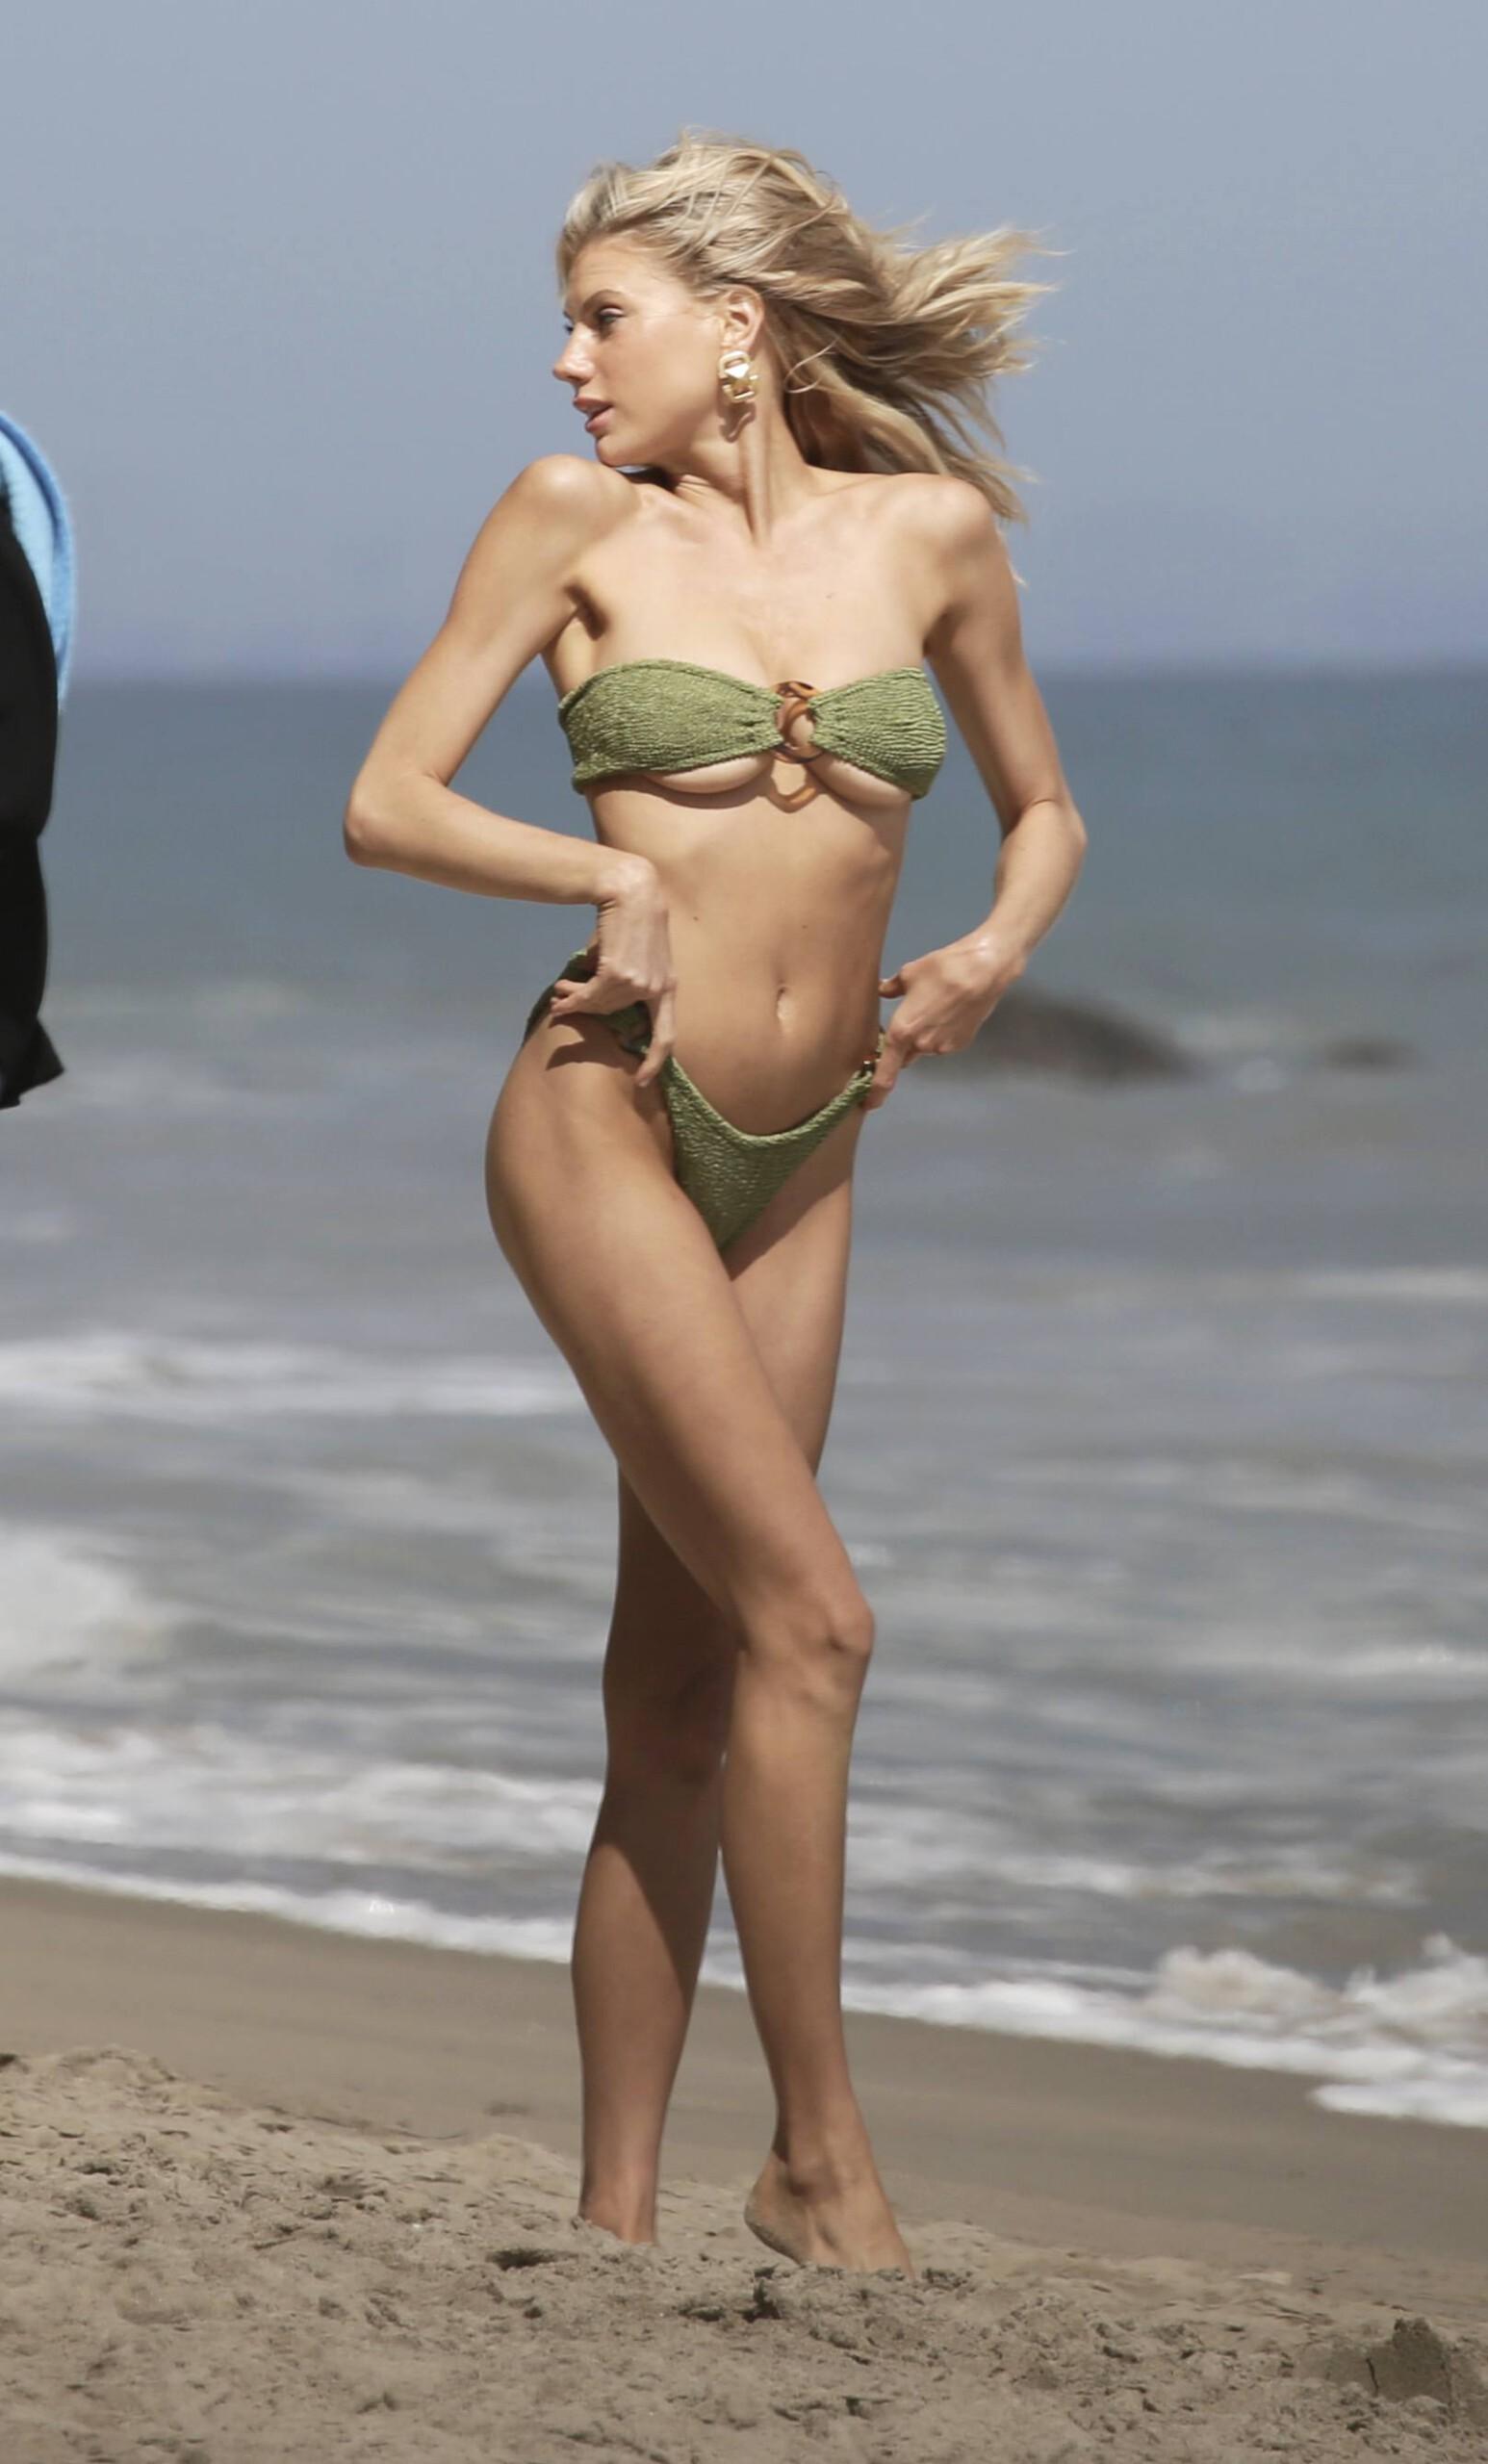 Charlotte Mckinney – Sexy Boobs In Tiny Bikini On The Beach In Los Angeles 0019